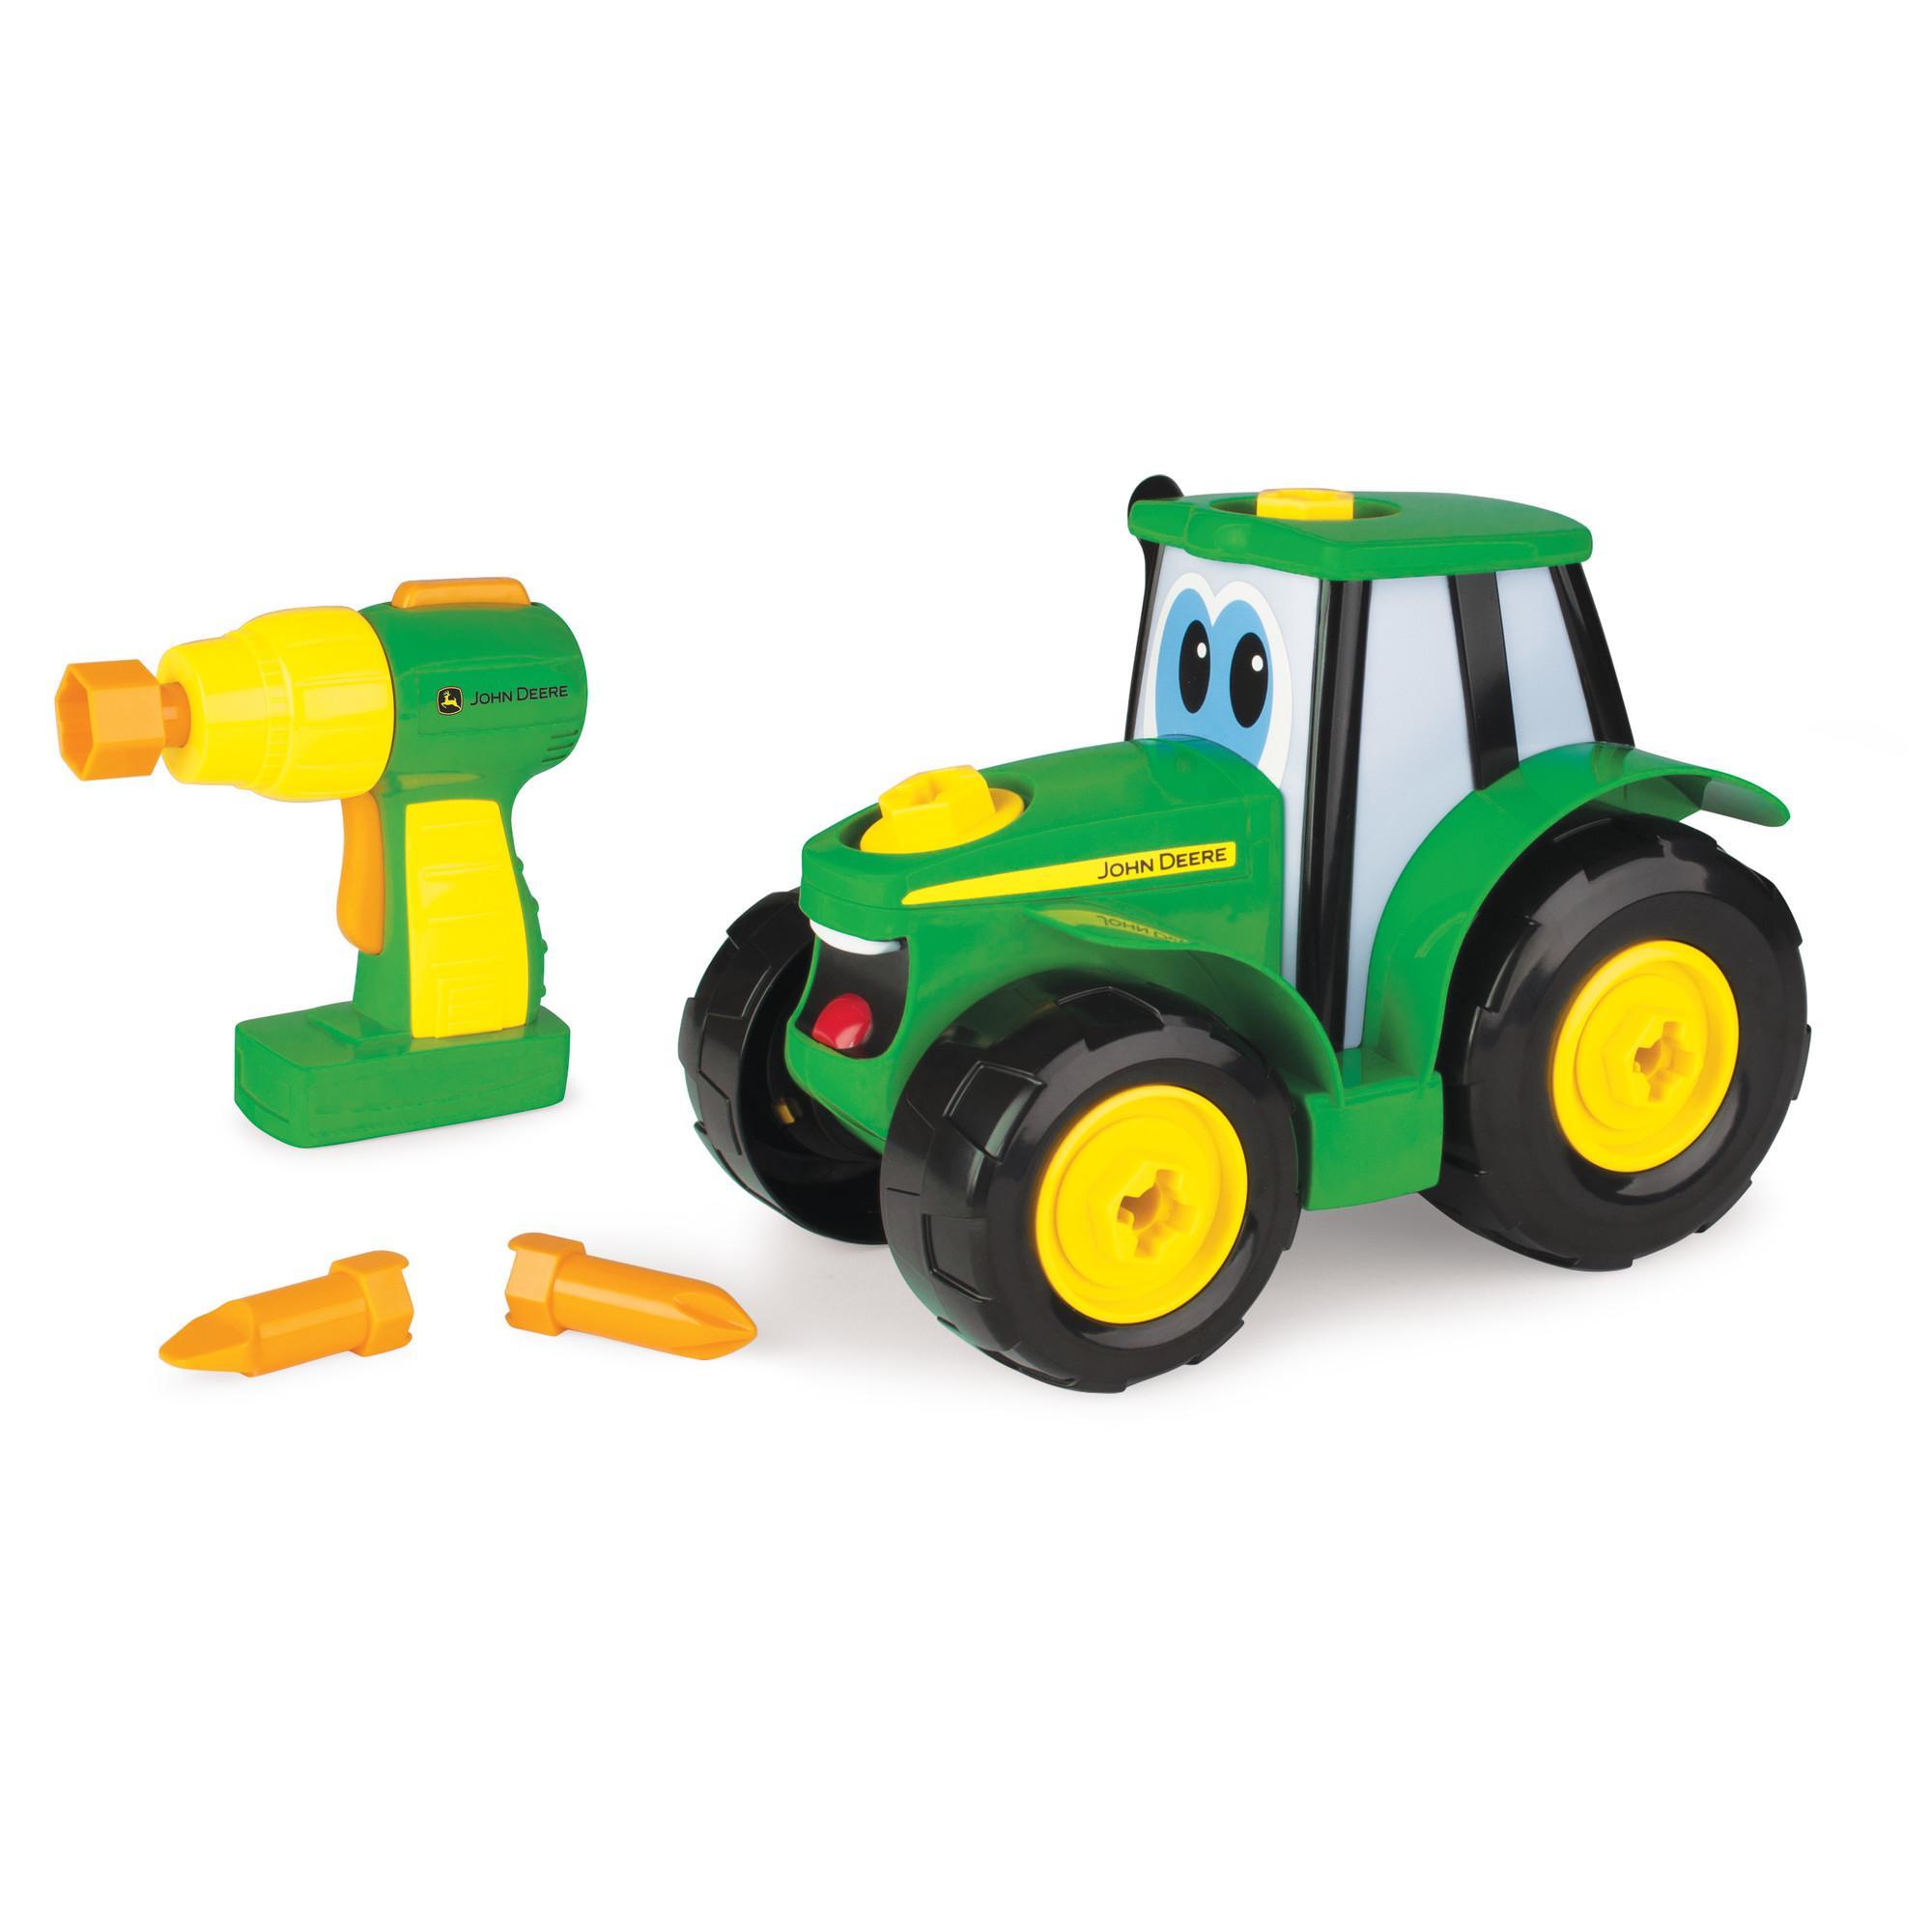 tomy john deere bau dir deinen johnny traktor kinder traktor zum selbstbauen. Black Bedroom Furniture Sets. Home Design Ideas